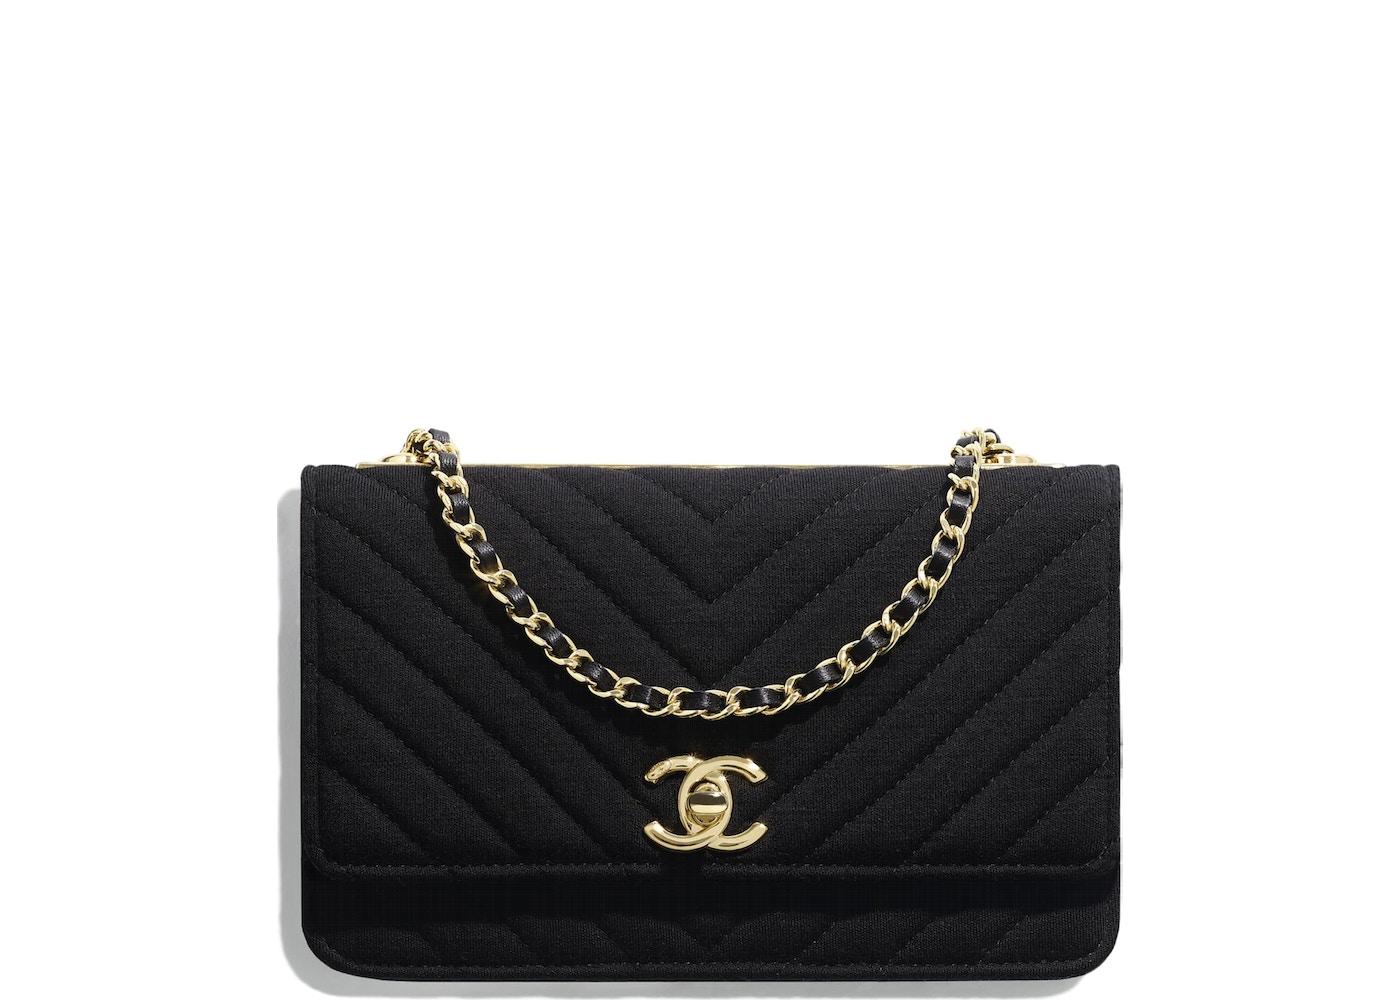 0c09bd60fec077 Chanel Wallet On Chain Chevron Jersey Gold-tone Black